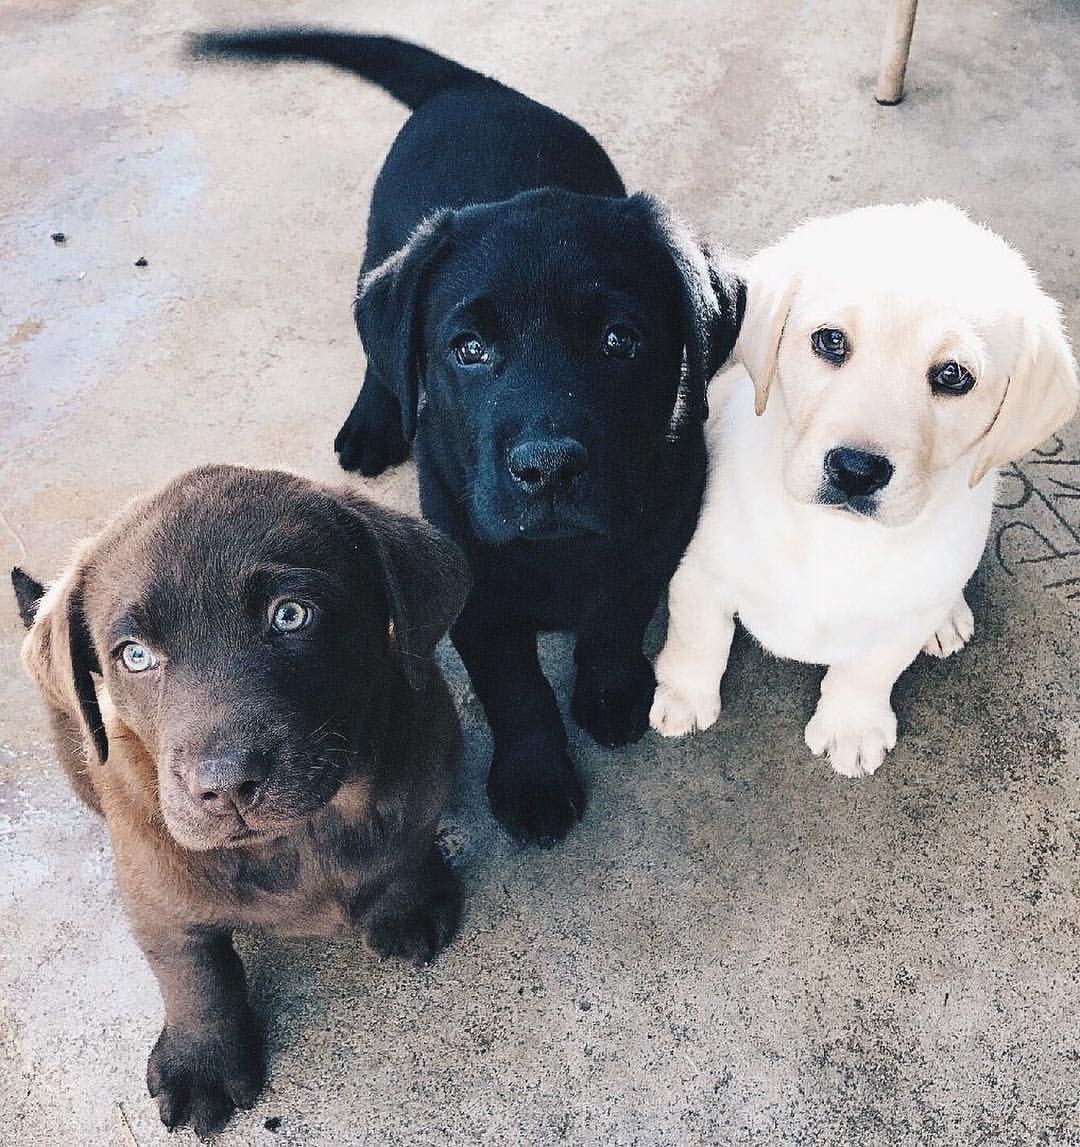 14 8k Likes 251 Comments Lulus Com Lulus On Instagram Squad Goals Lovelulus Via Obi Theblacklab Labradorretri Cute Dogs Lab Puppies Baby Animals